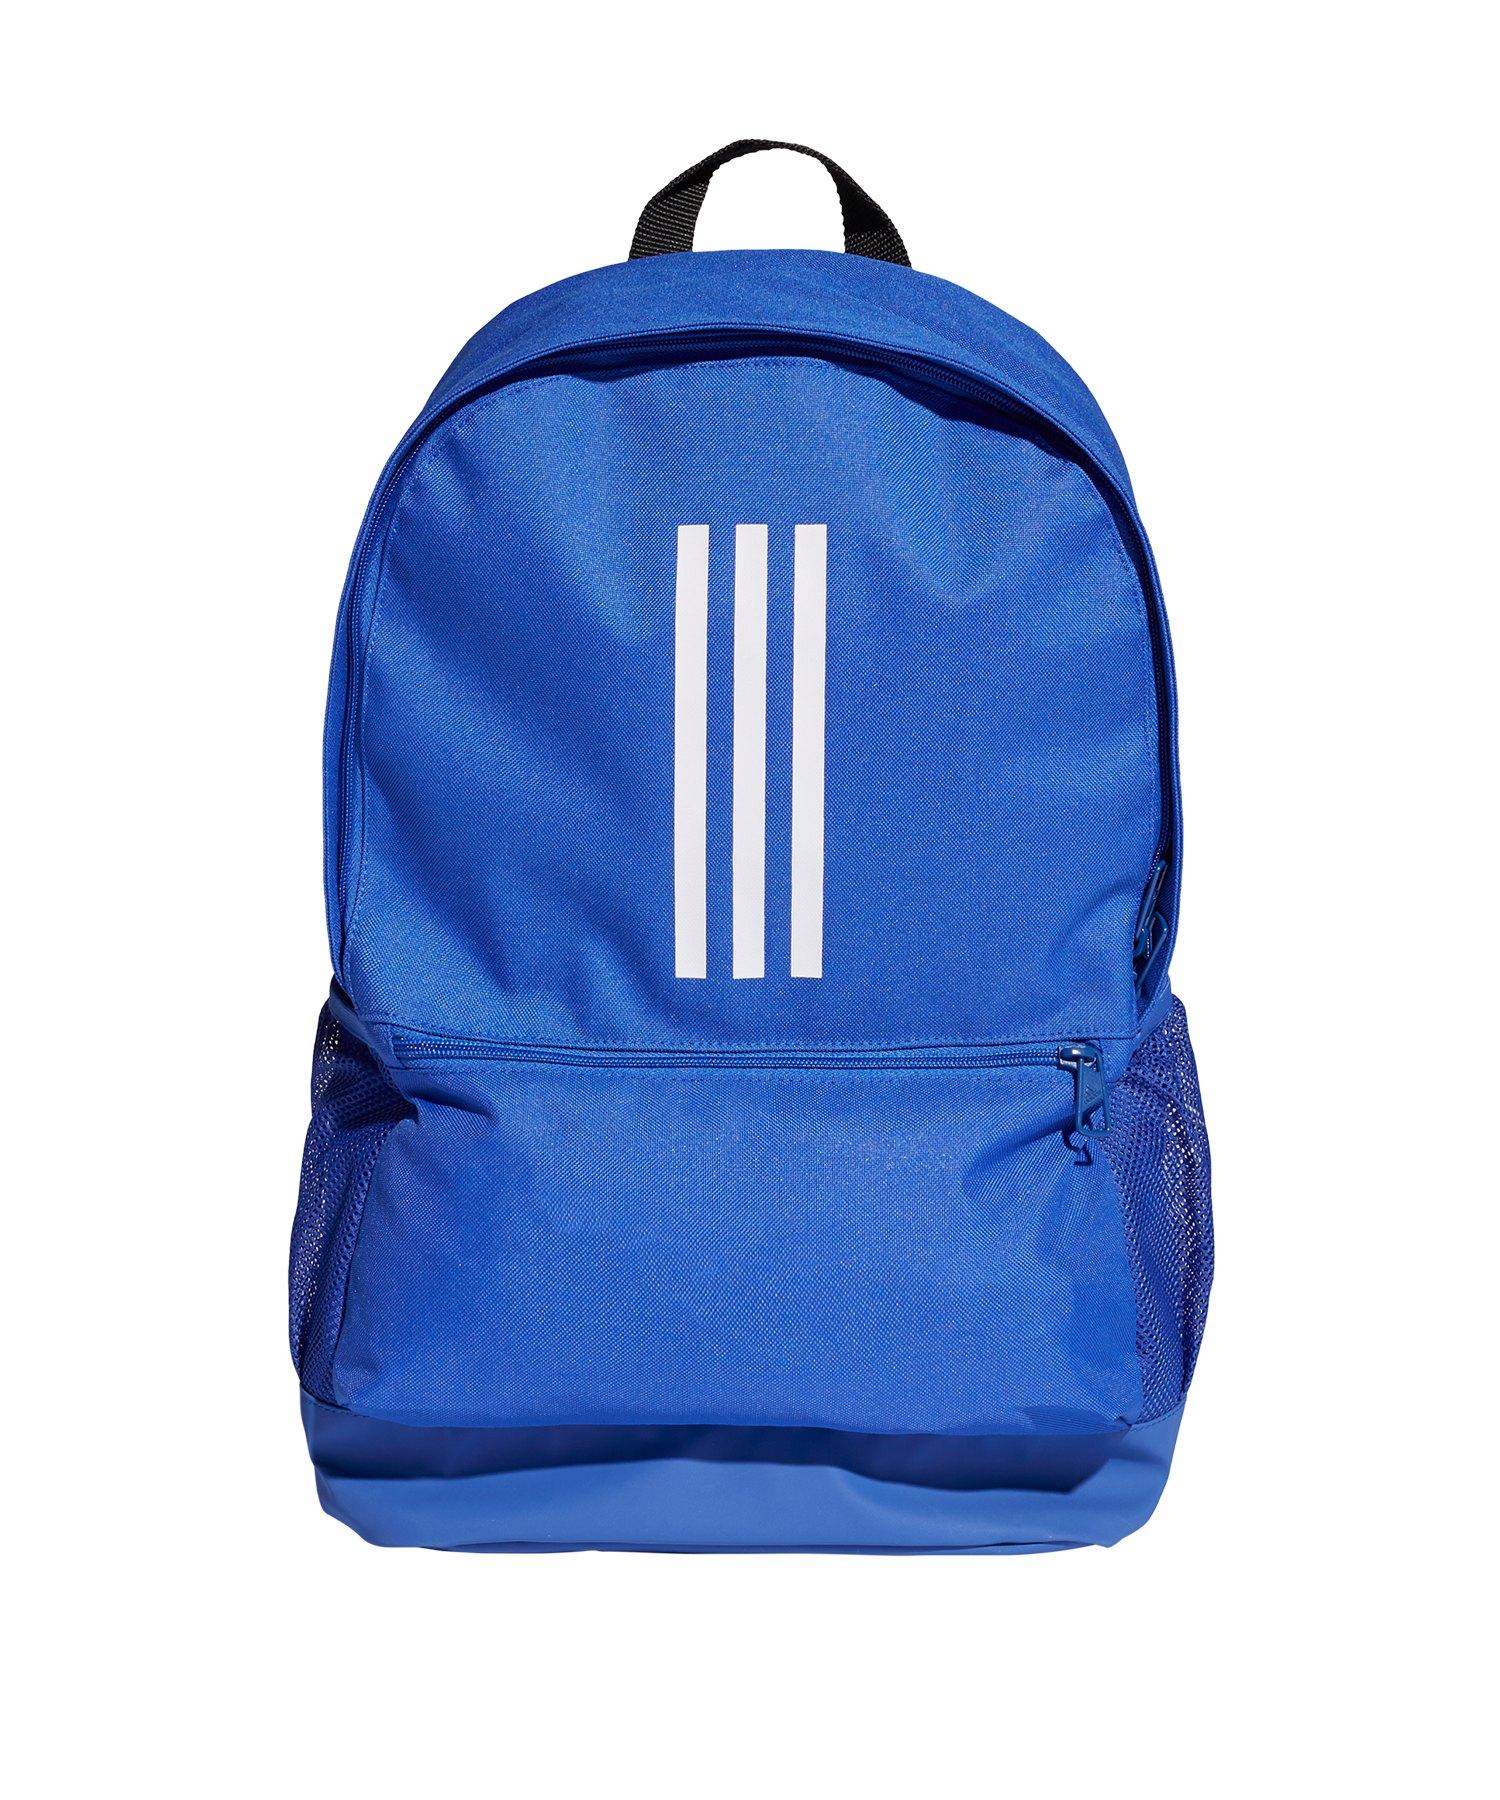 adidas Tiro Backpack Rucksack Blau Weiss - blau